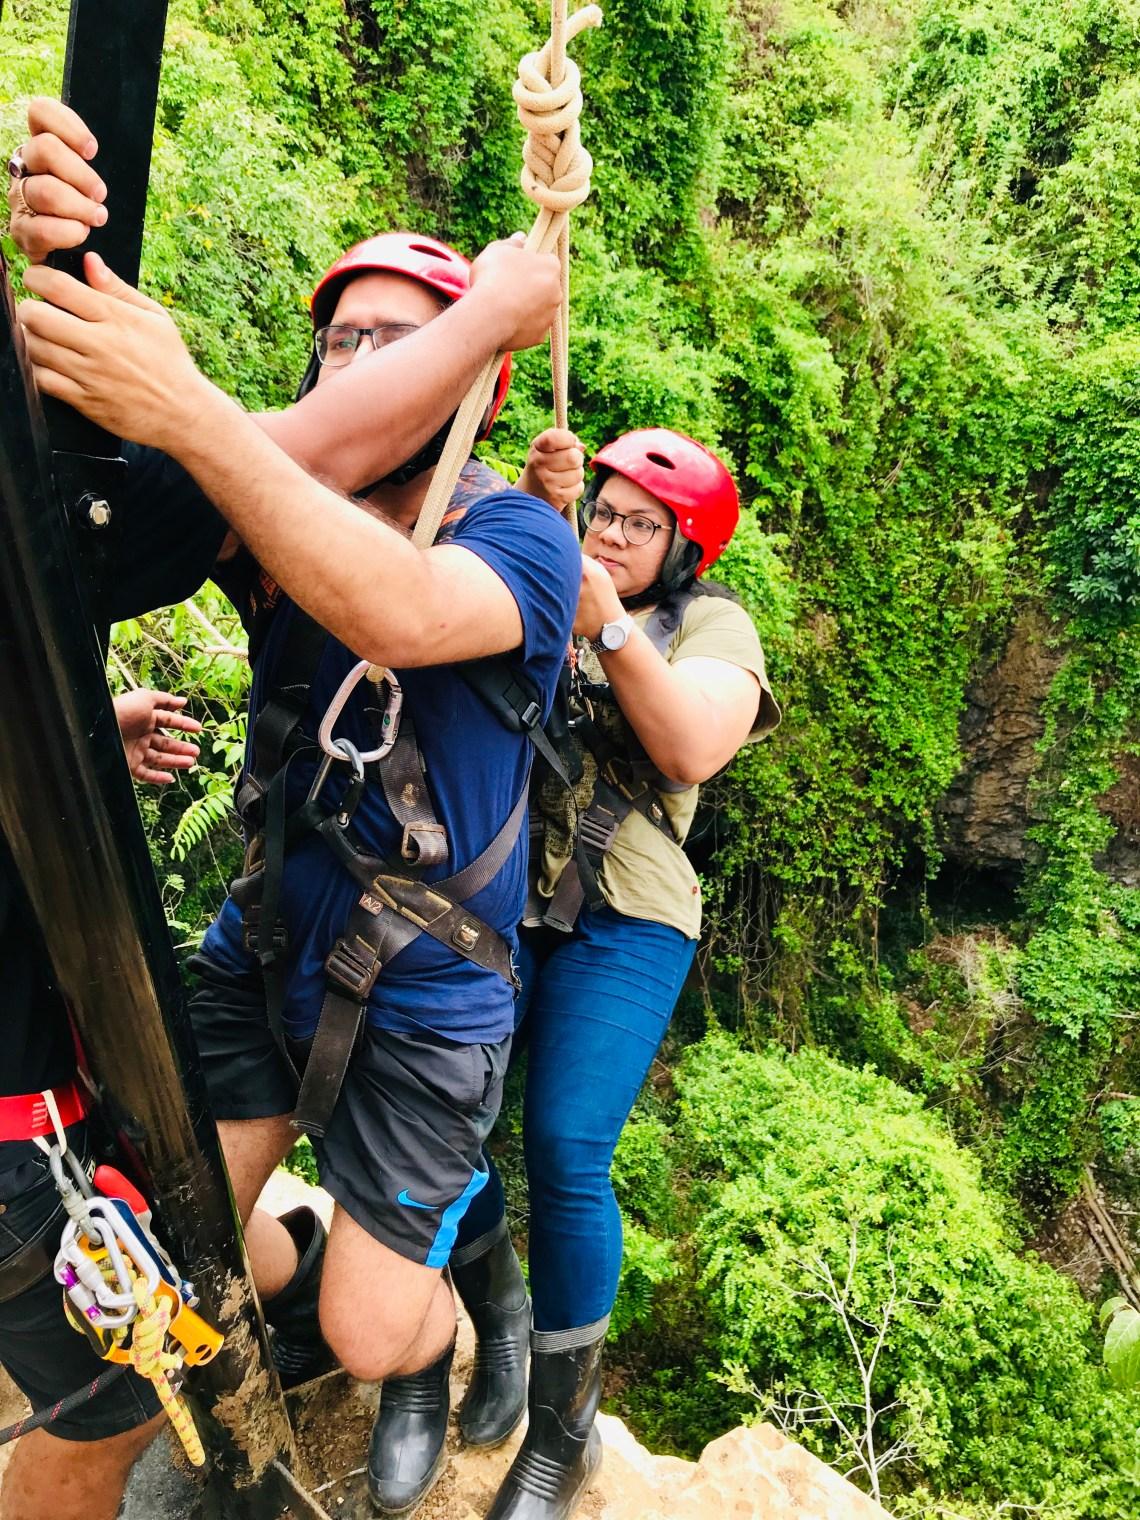 Jamblong cave exploration,  things to do in Yogyakarta.